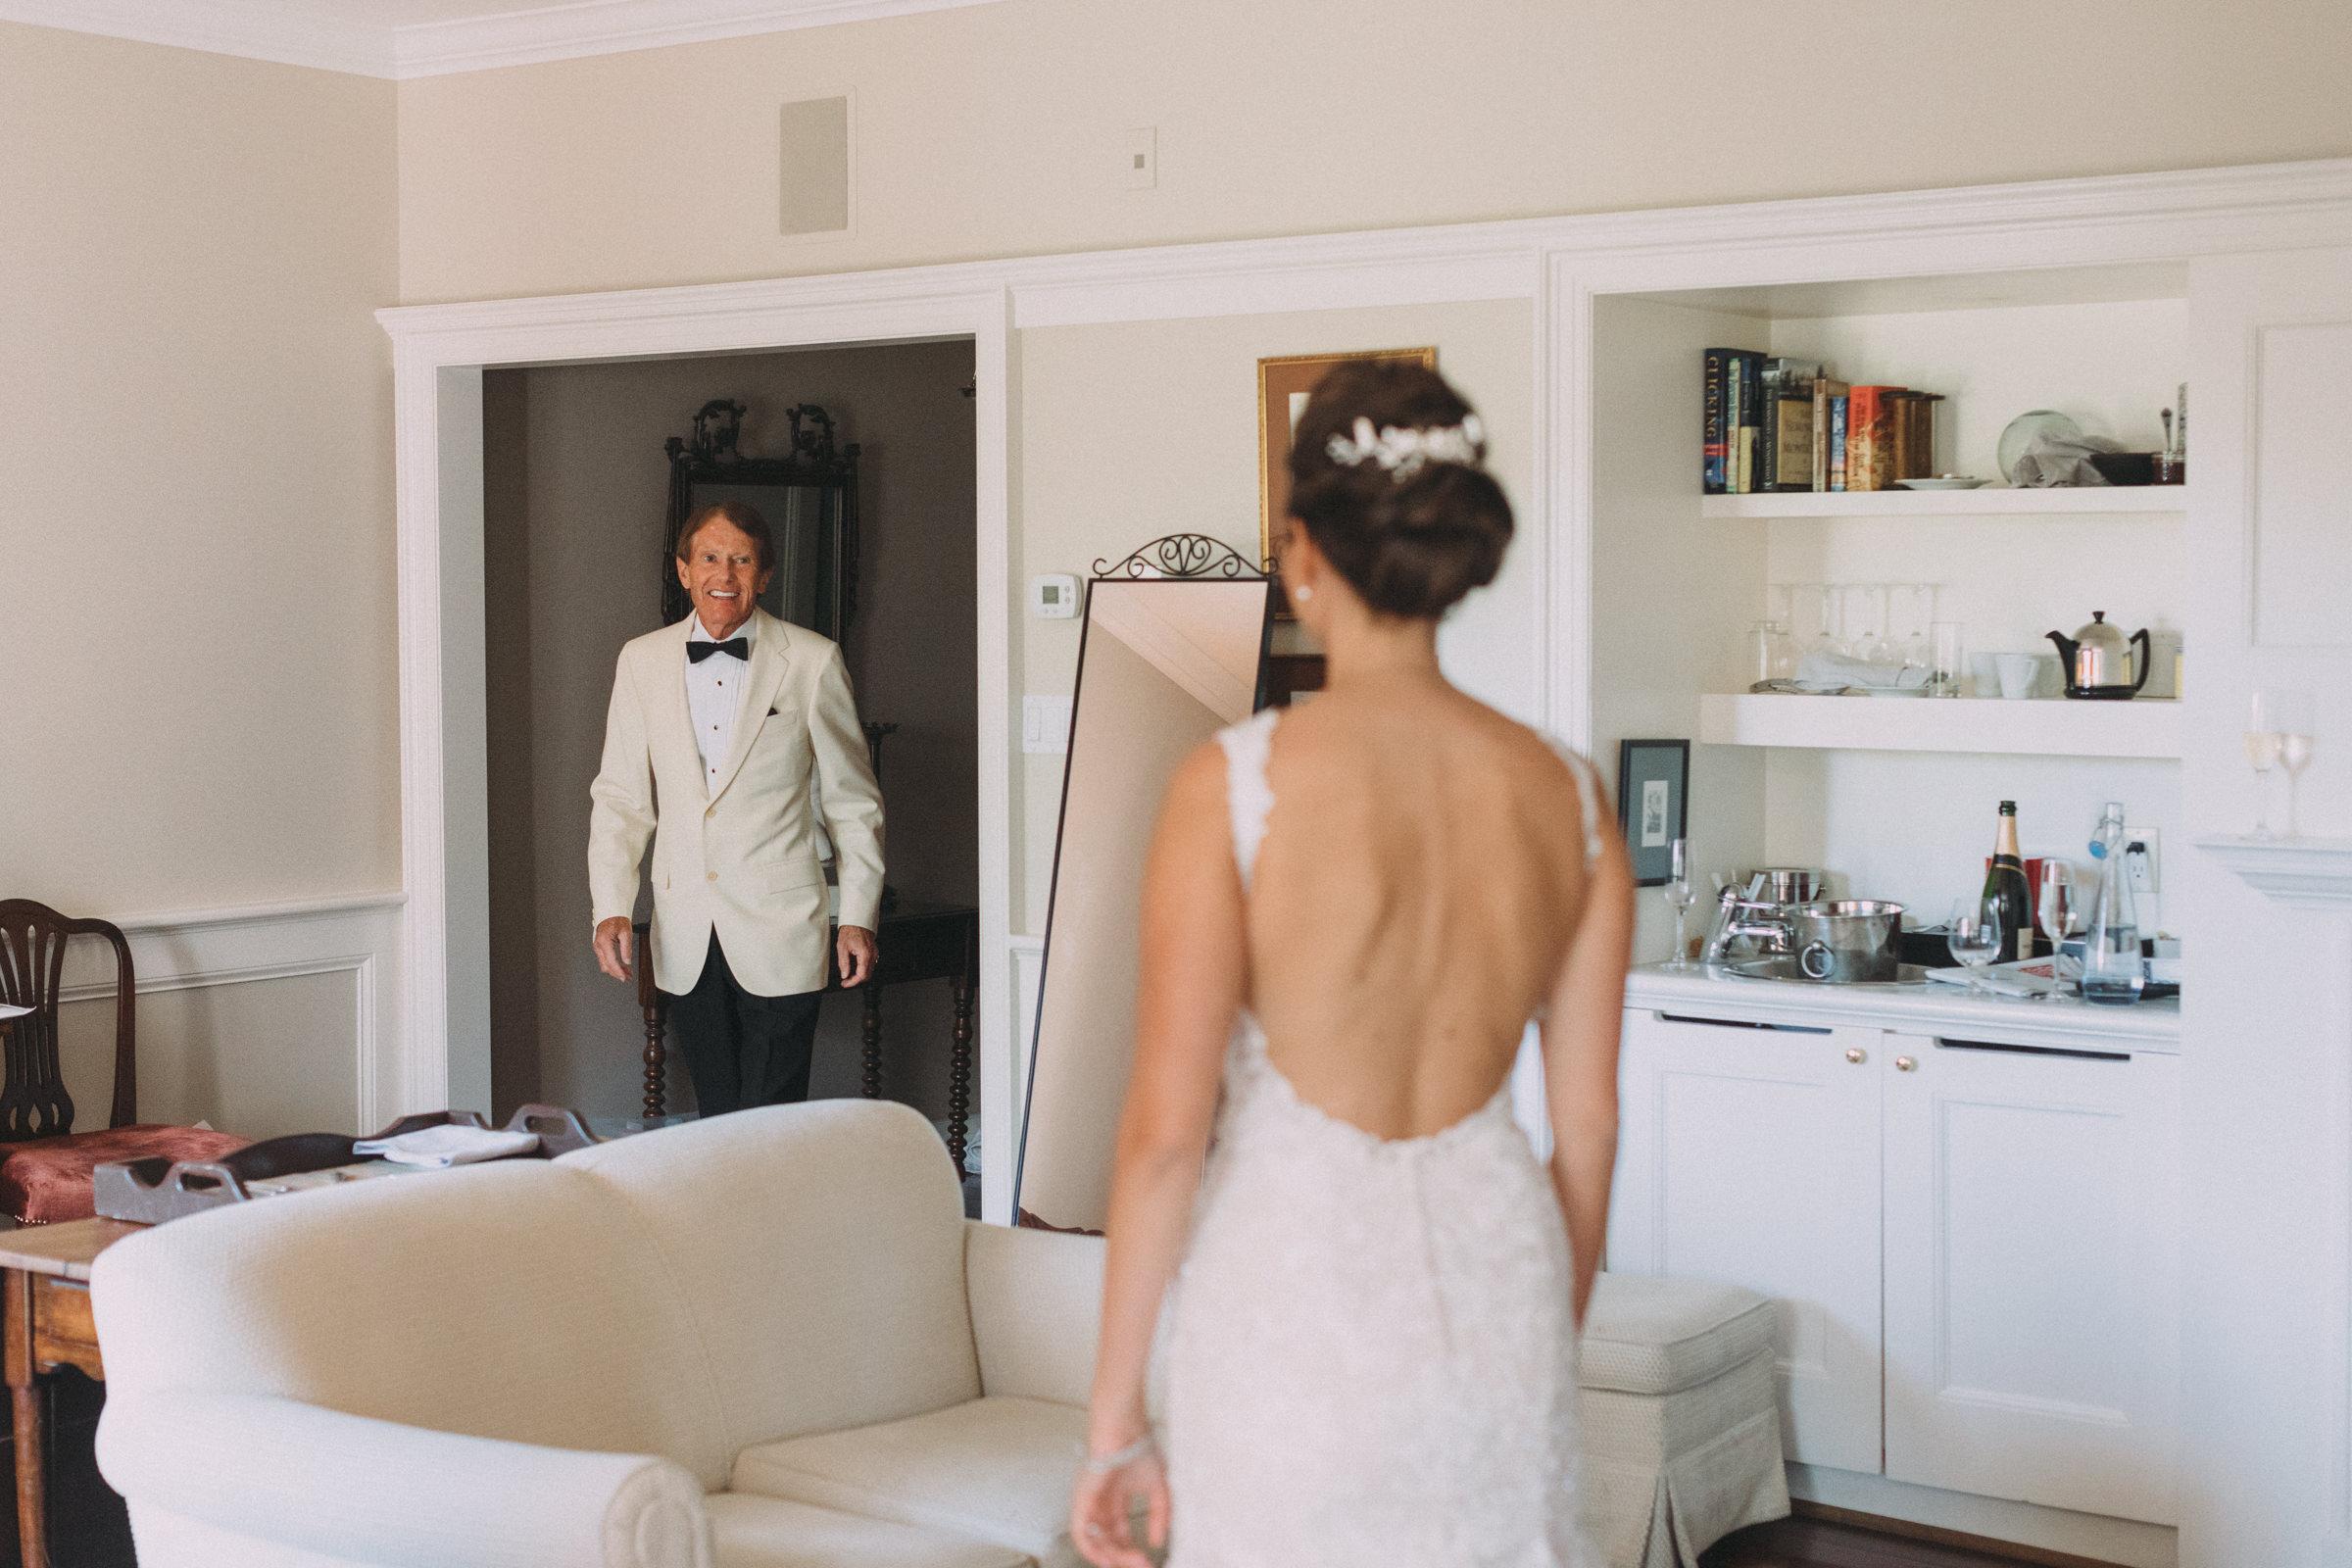 Langdon-Hall-wedding-photography-Cambridge-by-Sam-Wong-of-Visual-Cravings_Sarah-Ryan_14.jpg